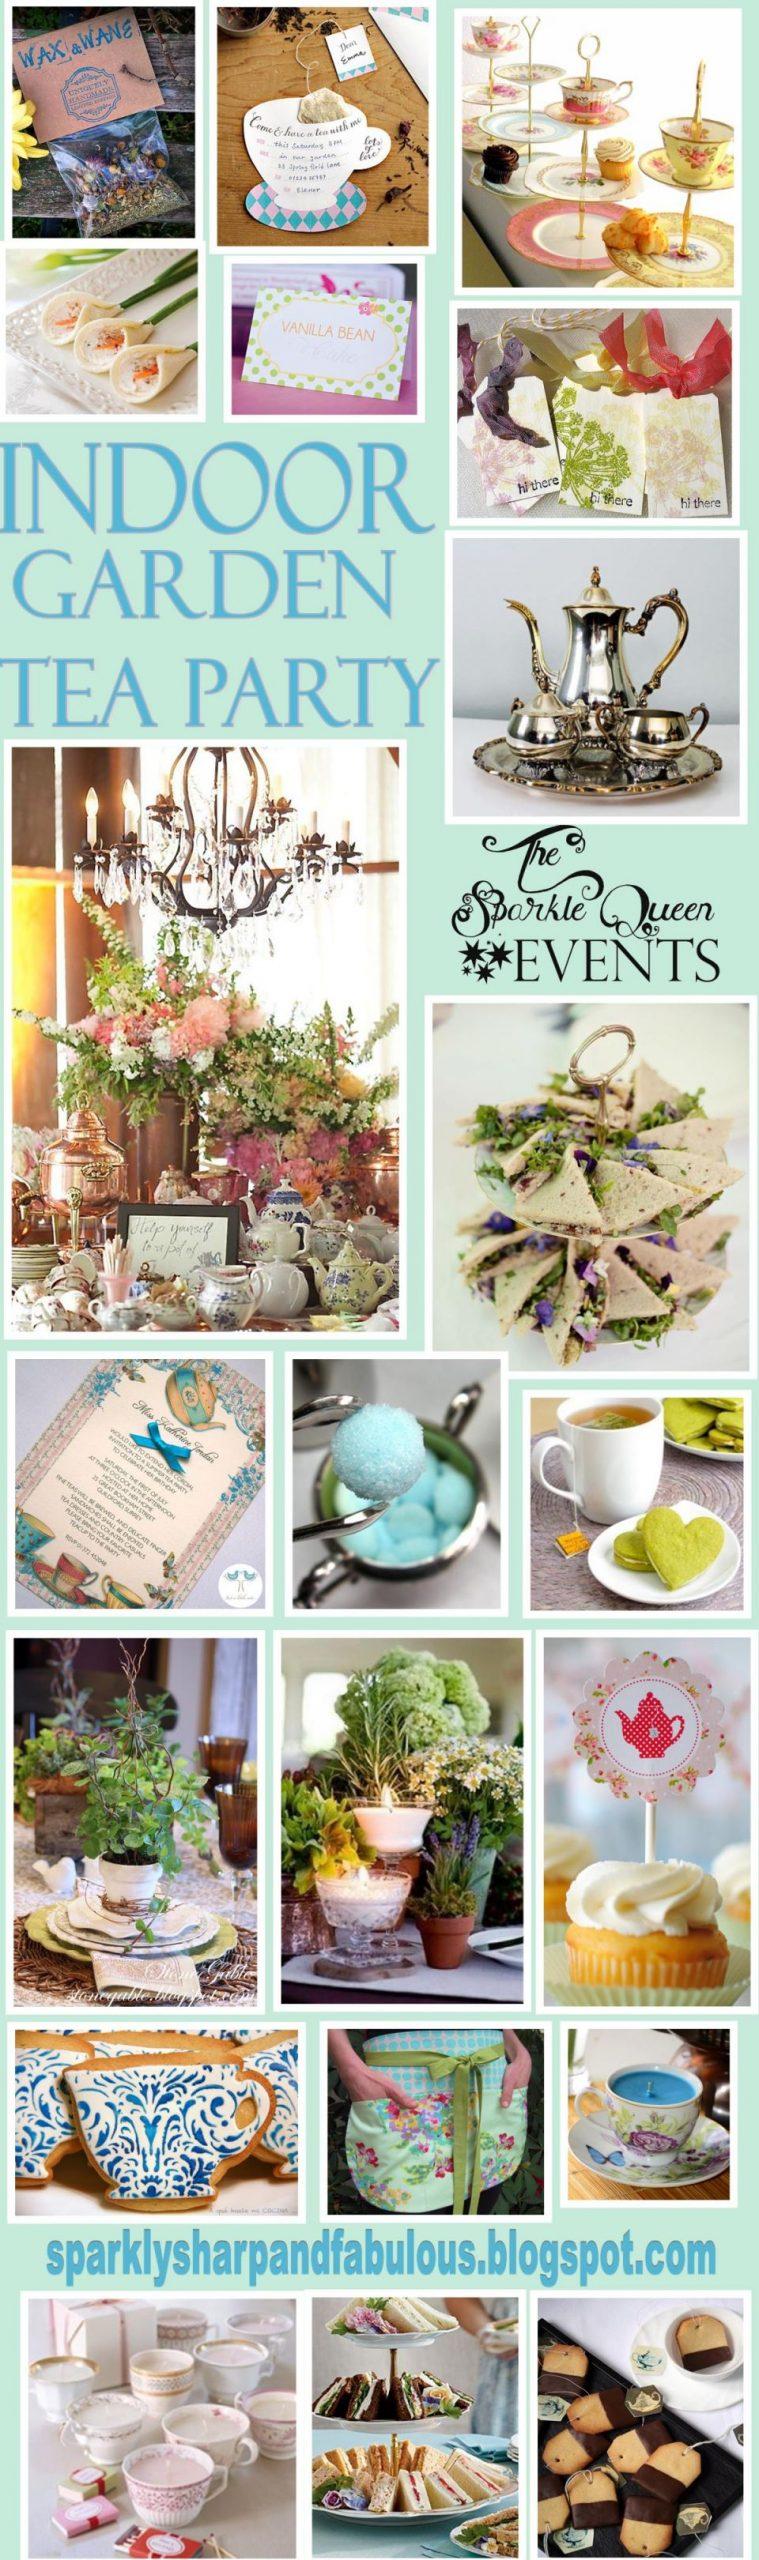 Wonderful Indoor Garden Party Ideas